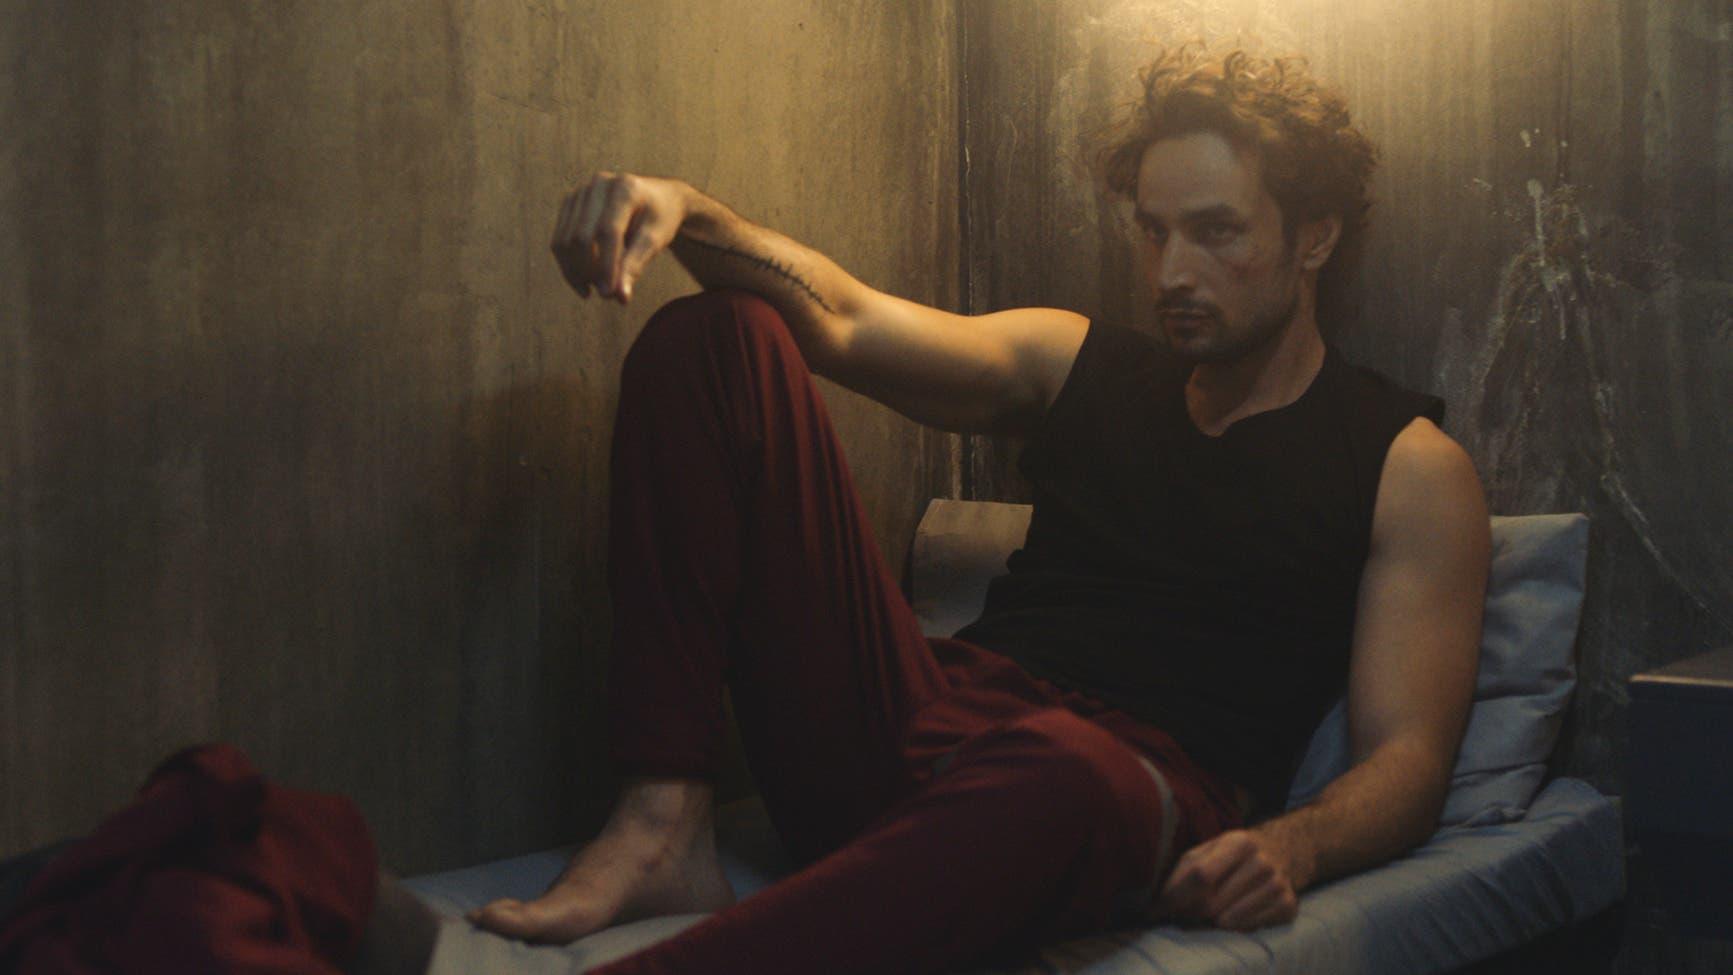 Palestinian actor Adam Bakri. (Supplied)